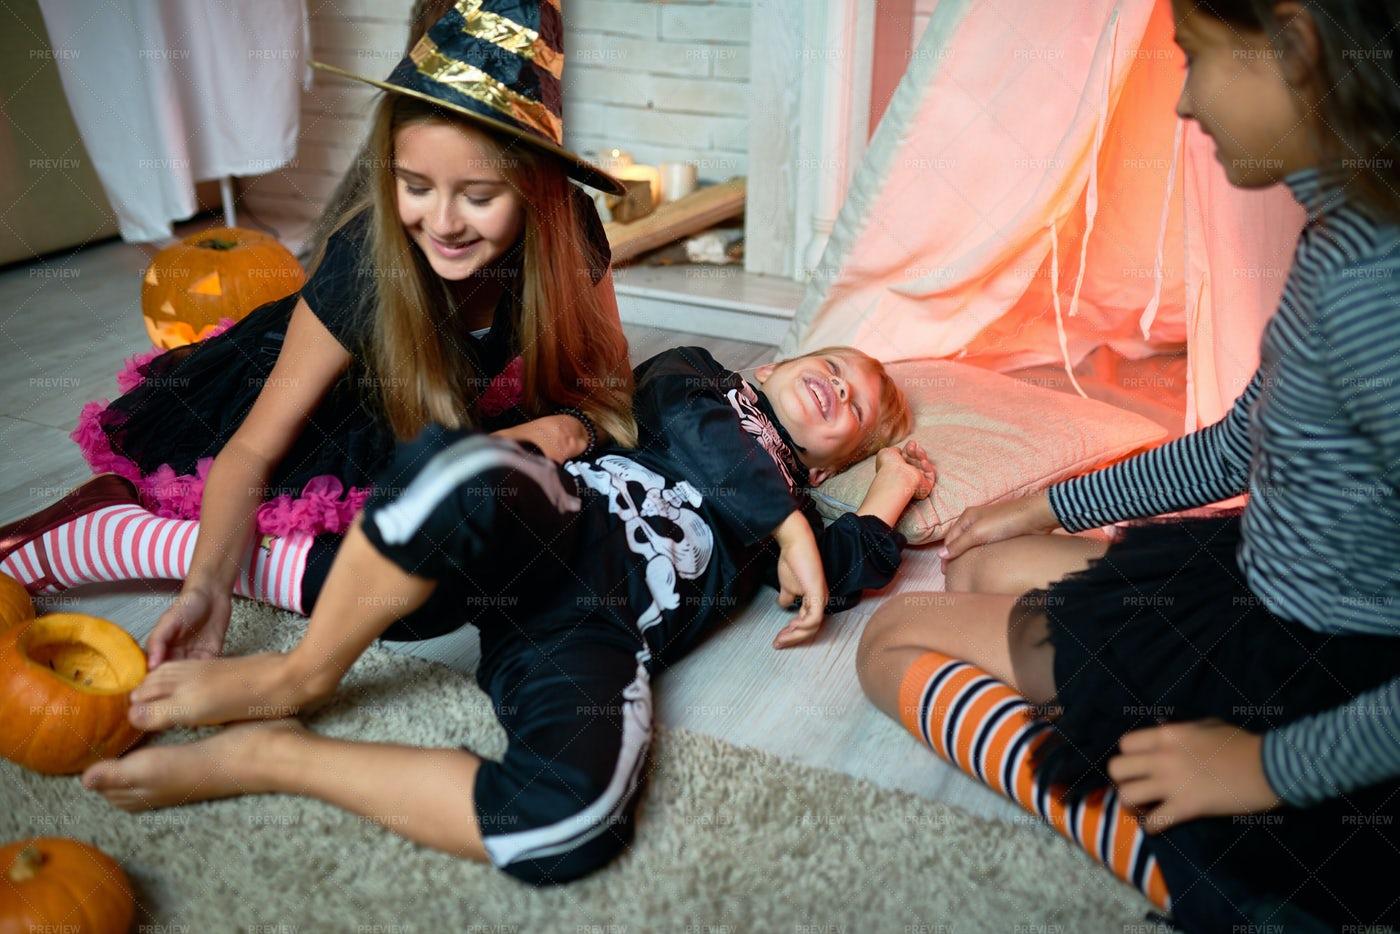 Jolly Girl Tickling Foot Of Friend: Stock Photos